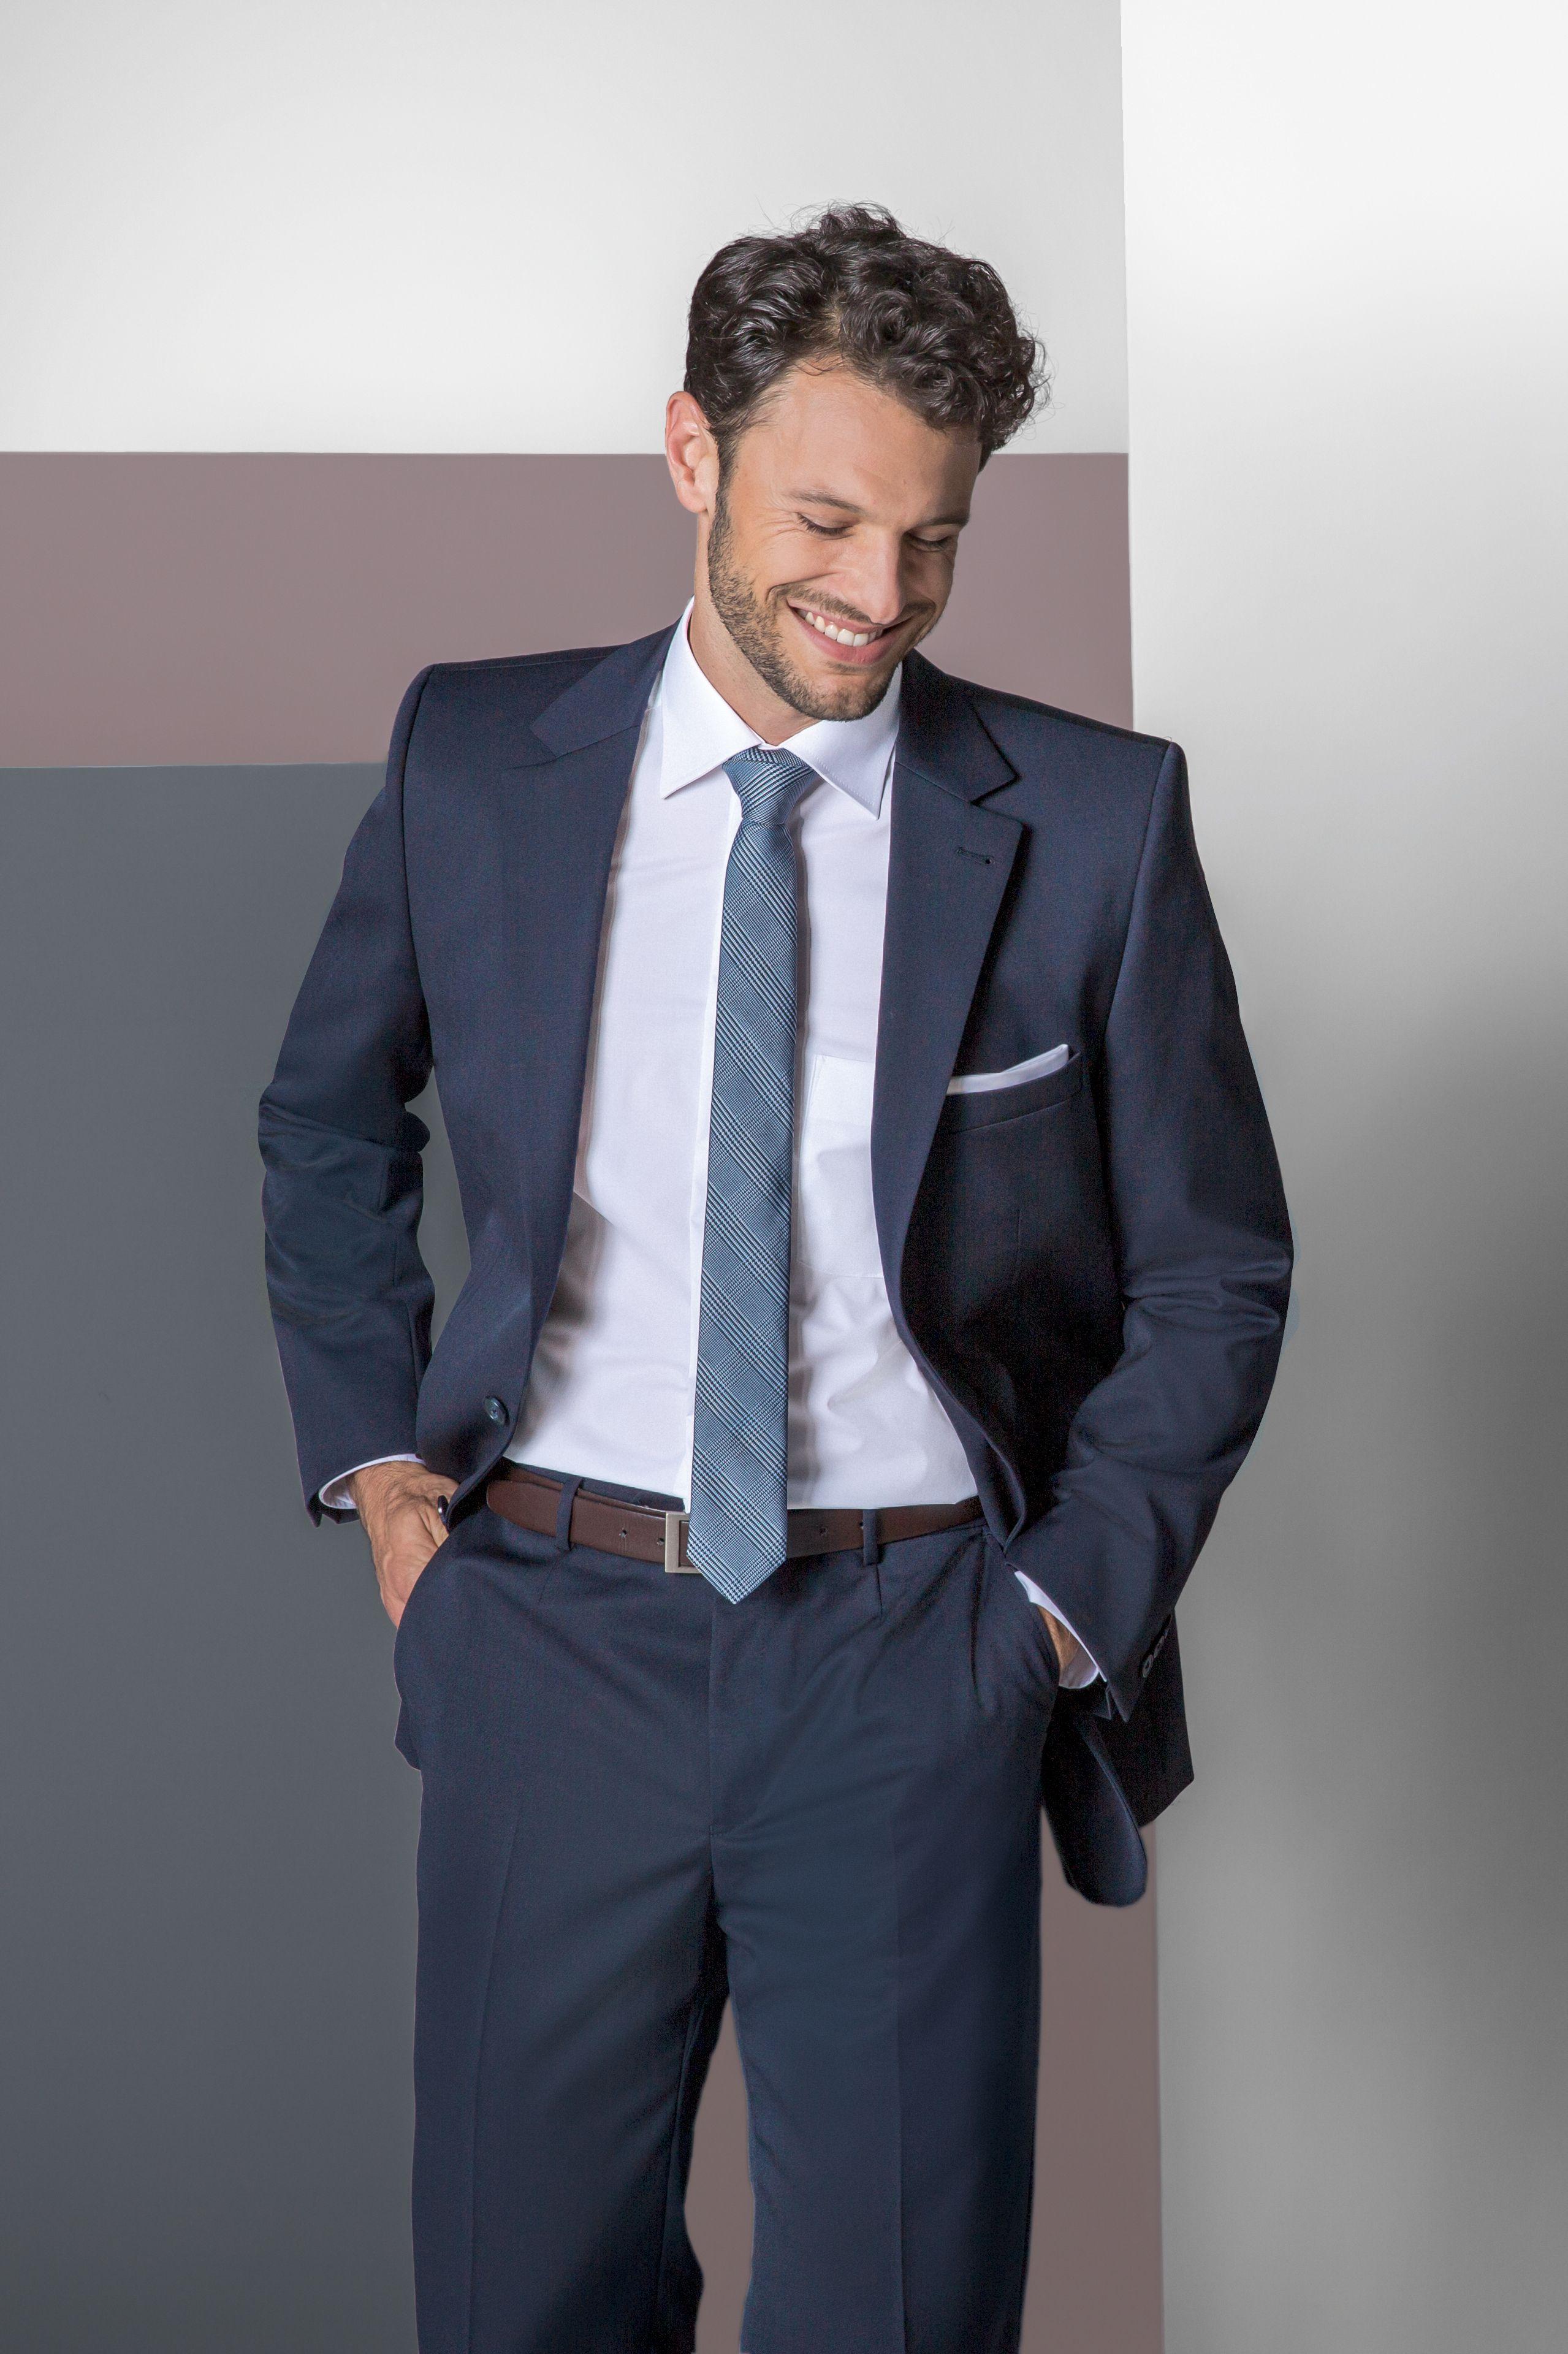 COLLECTION 201920 BASIC suit, dark blue, shirt, white